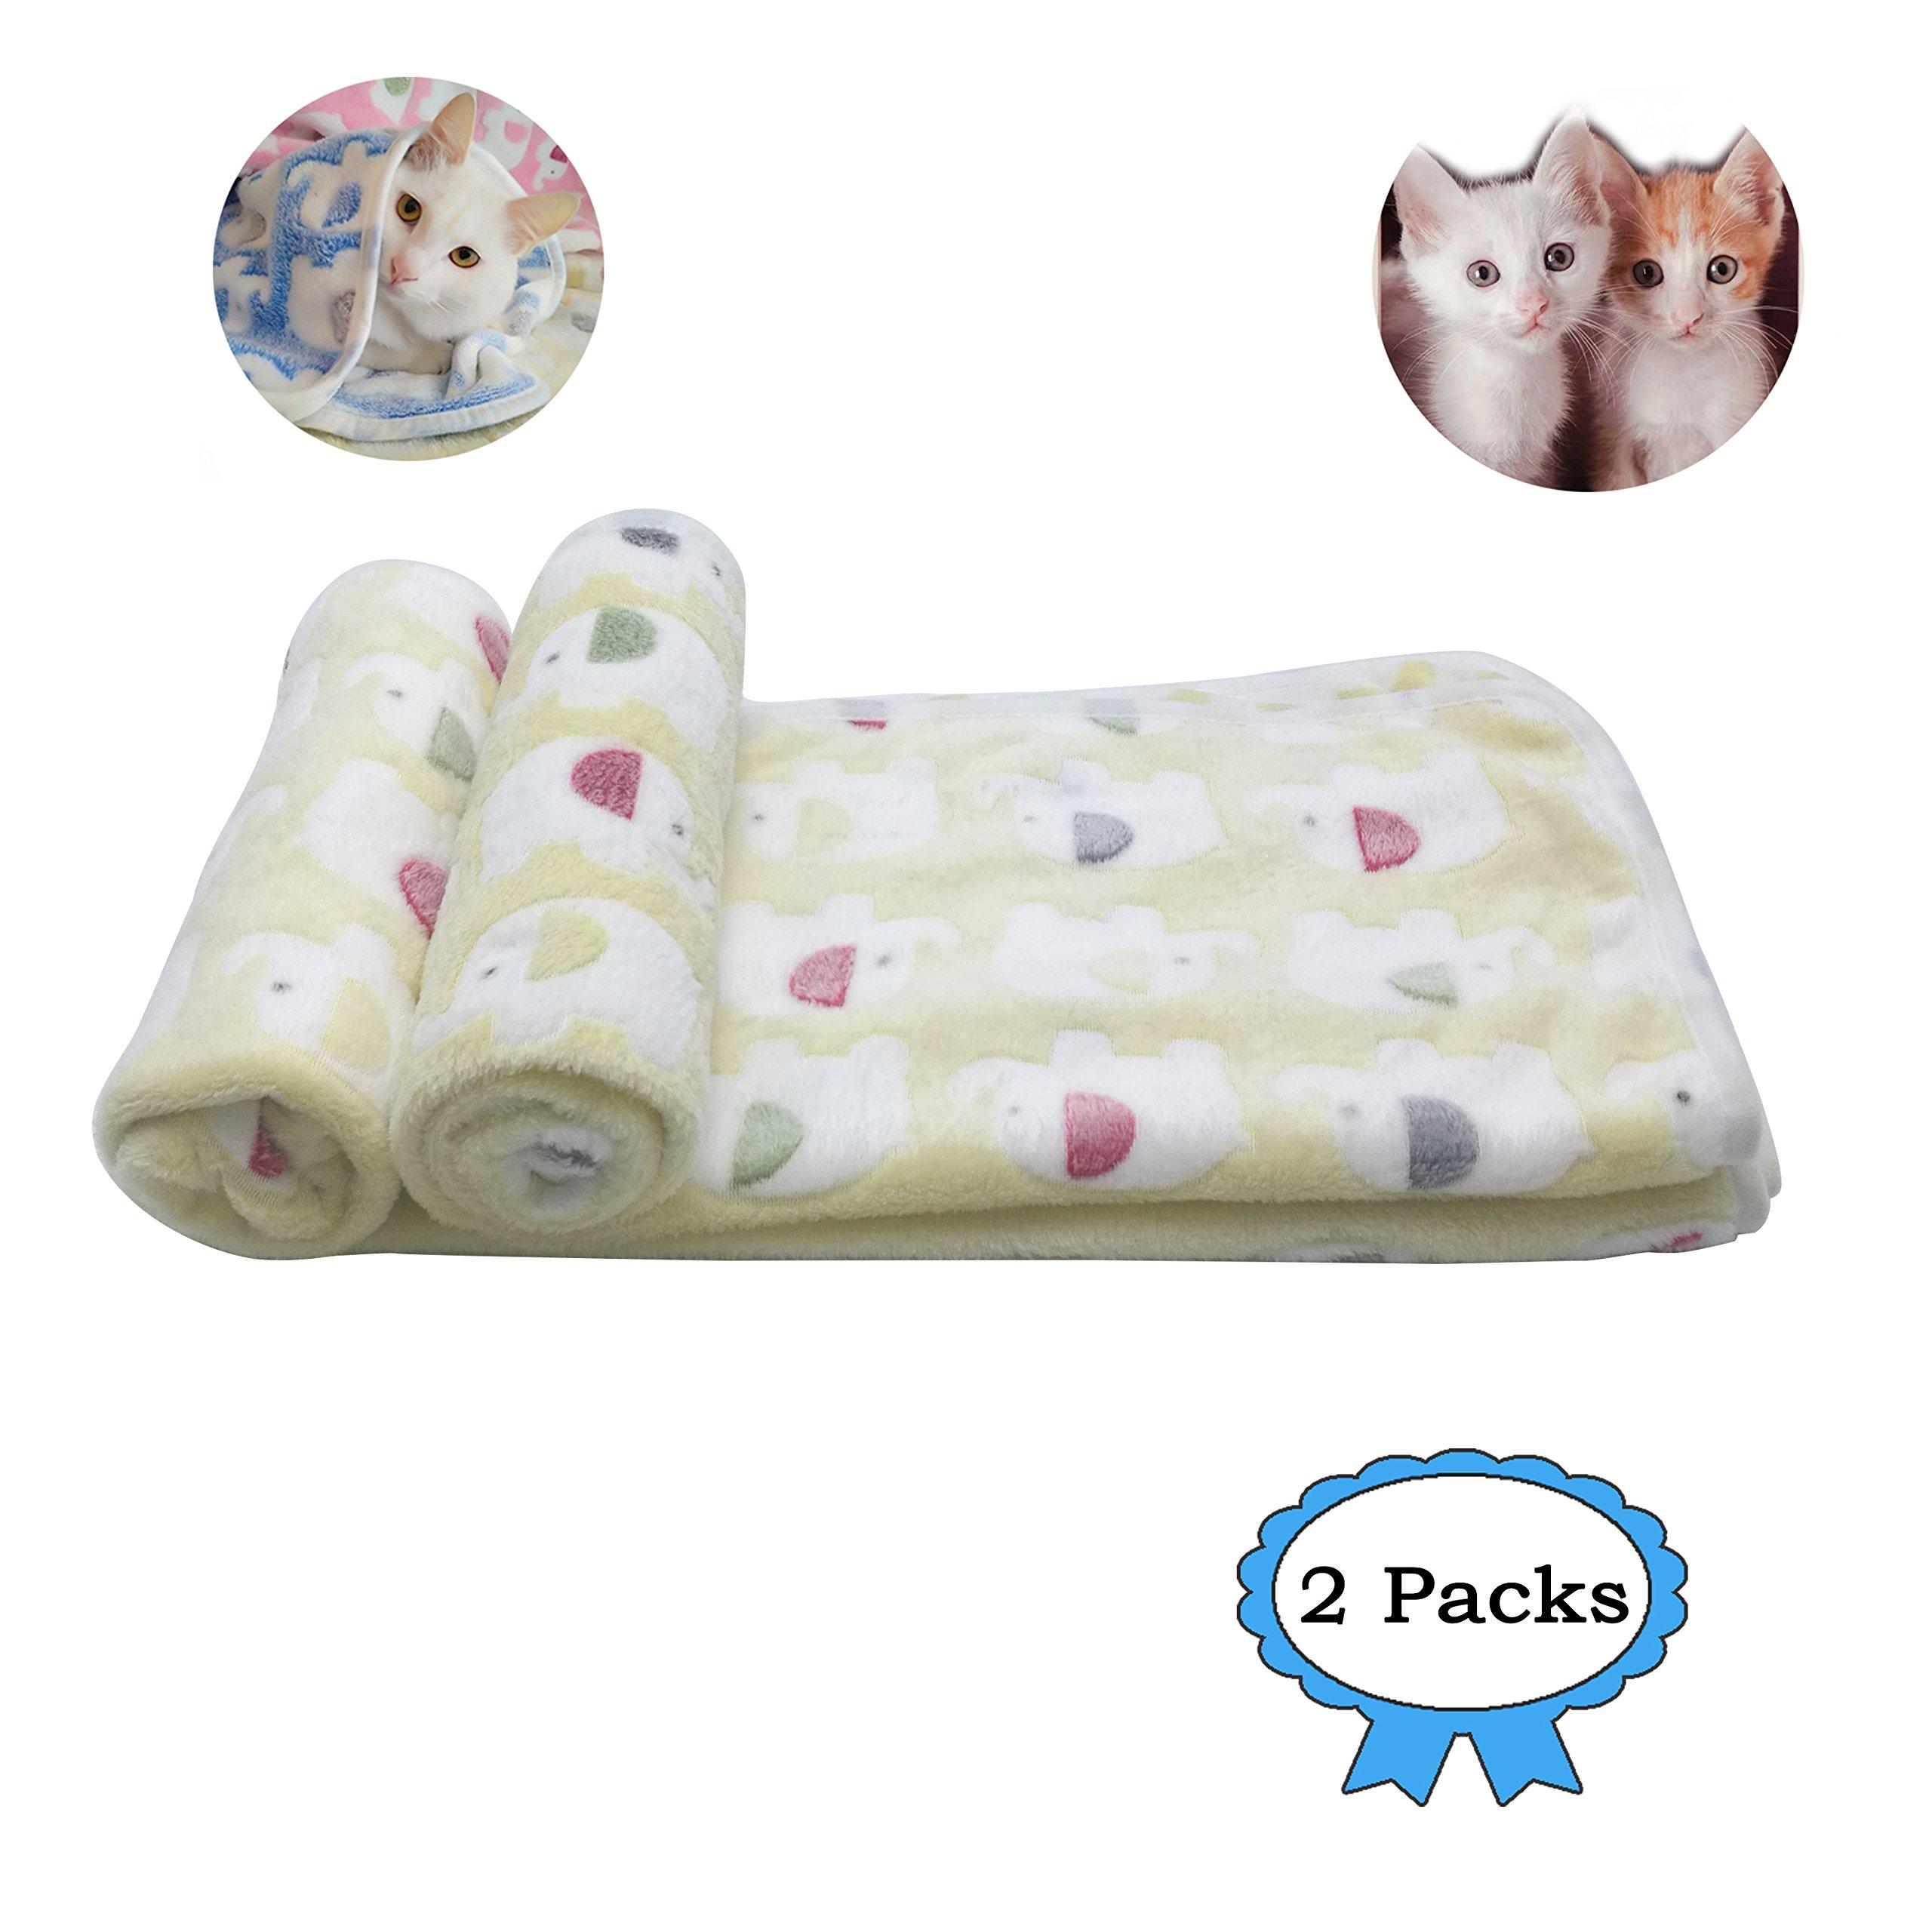 2 Packs Large 43'' x 35'' Cat Blanket Yellow Soft Warm Fleece Throw Blanket Pet Dog Blanket Fleece Puppy Blanket Cushion Ultra Light Comfortable Soft Warm Sleep Mat by Yizhi Miaow (Image #1)